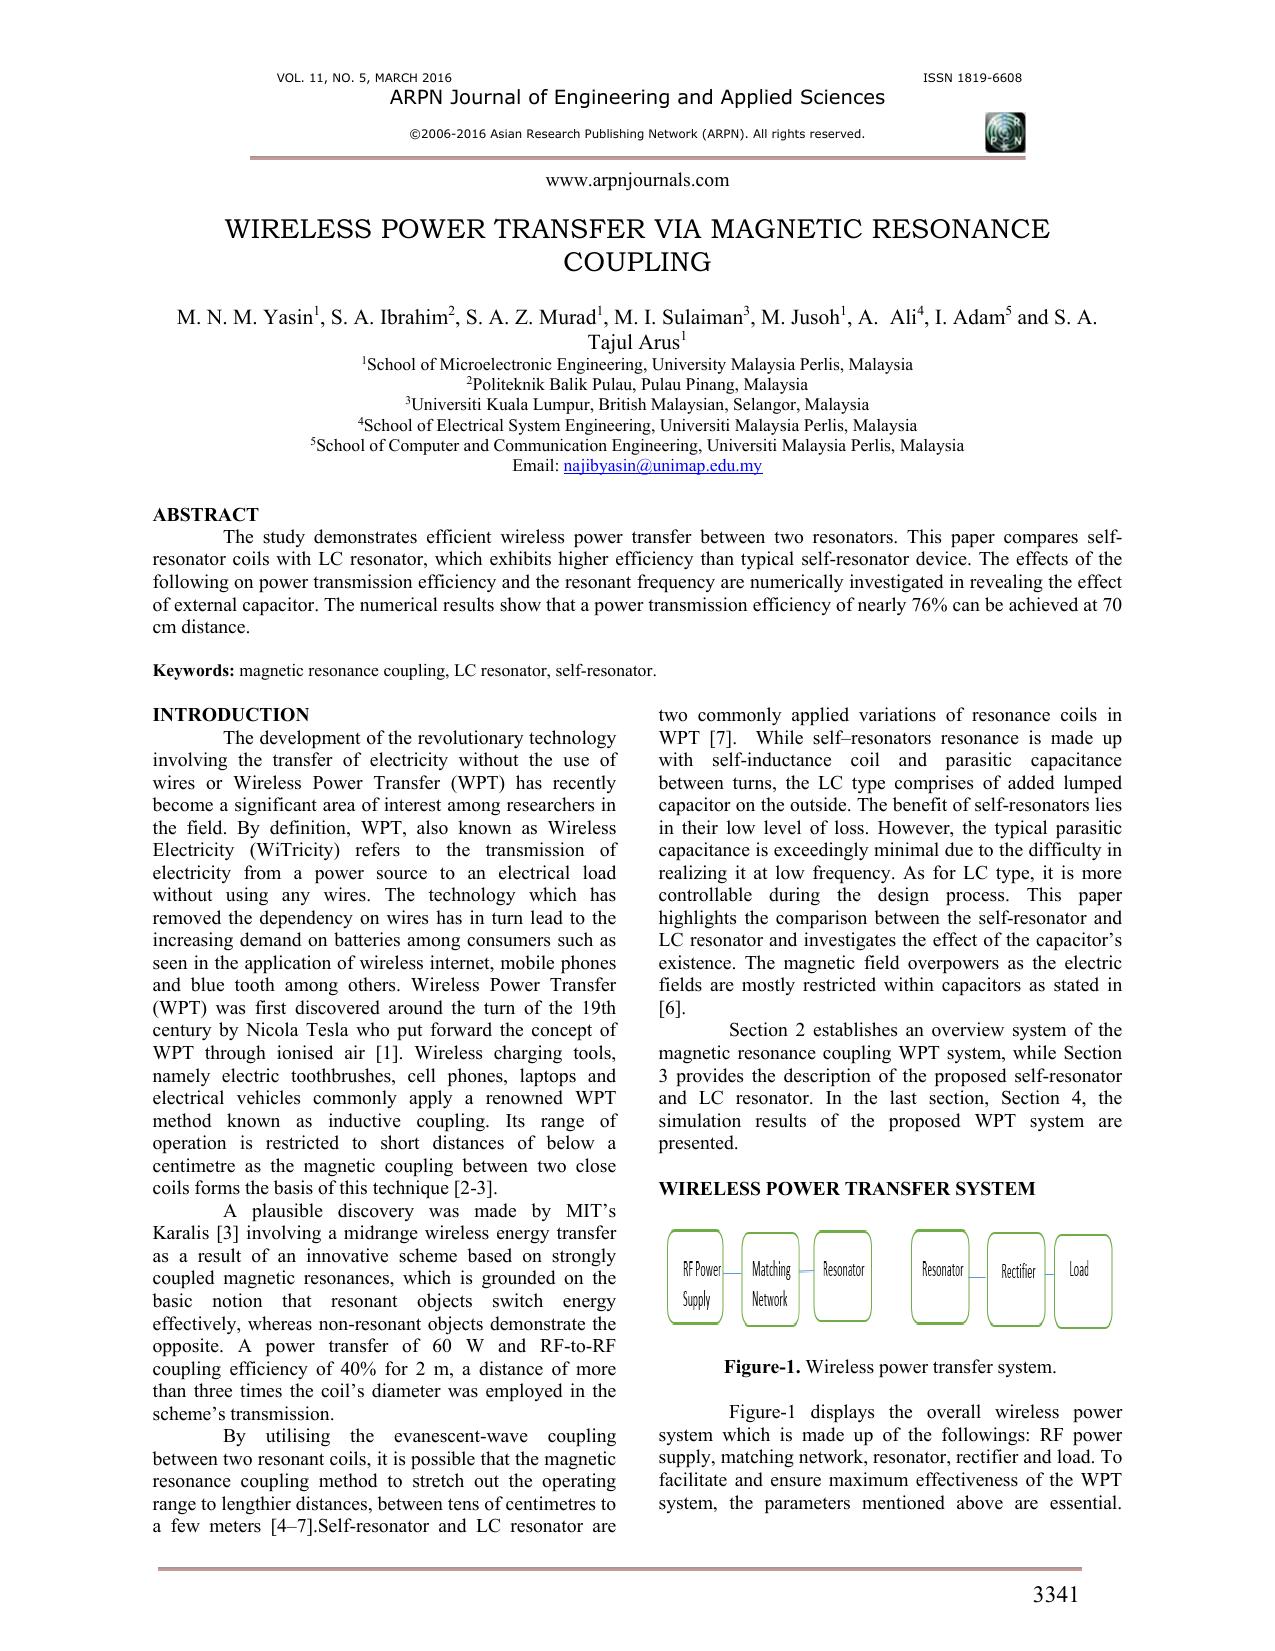 wireless power transfer via magnetic resonance coupling